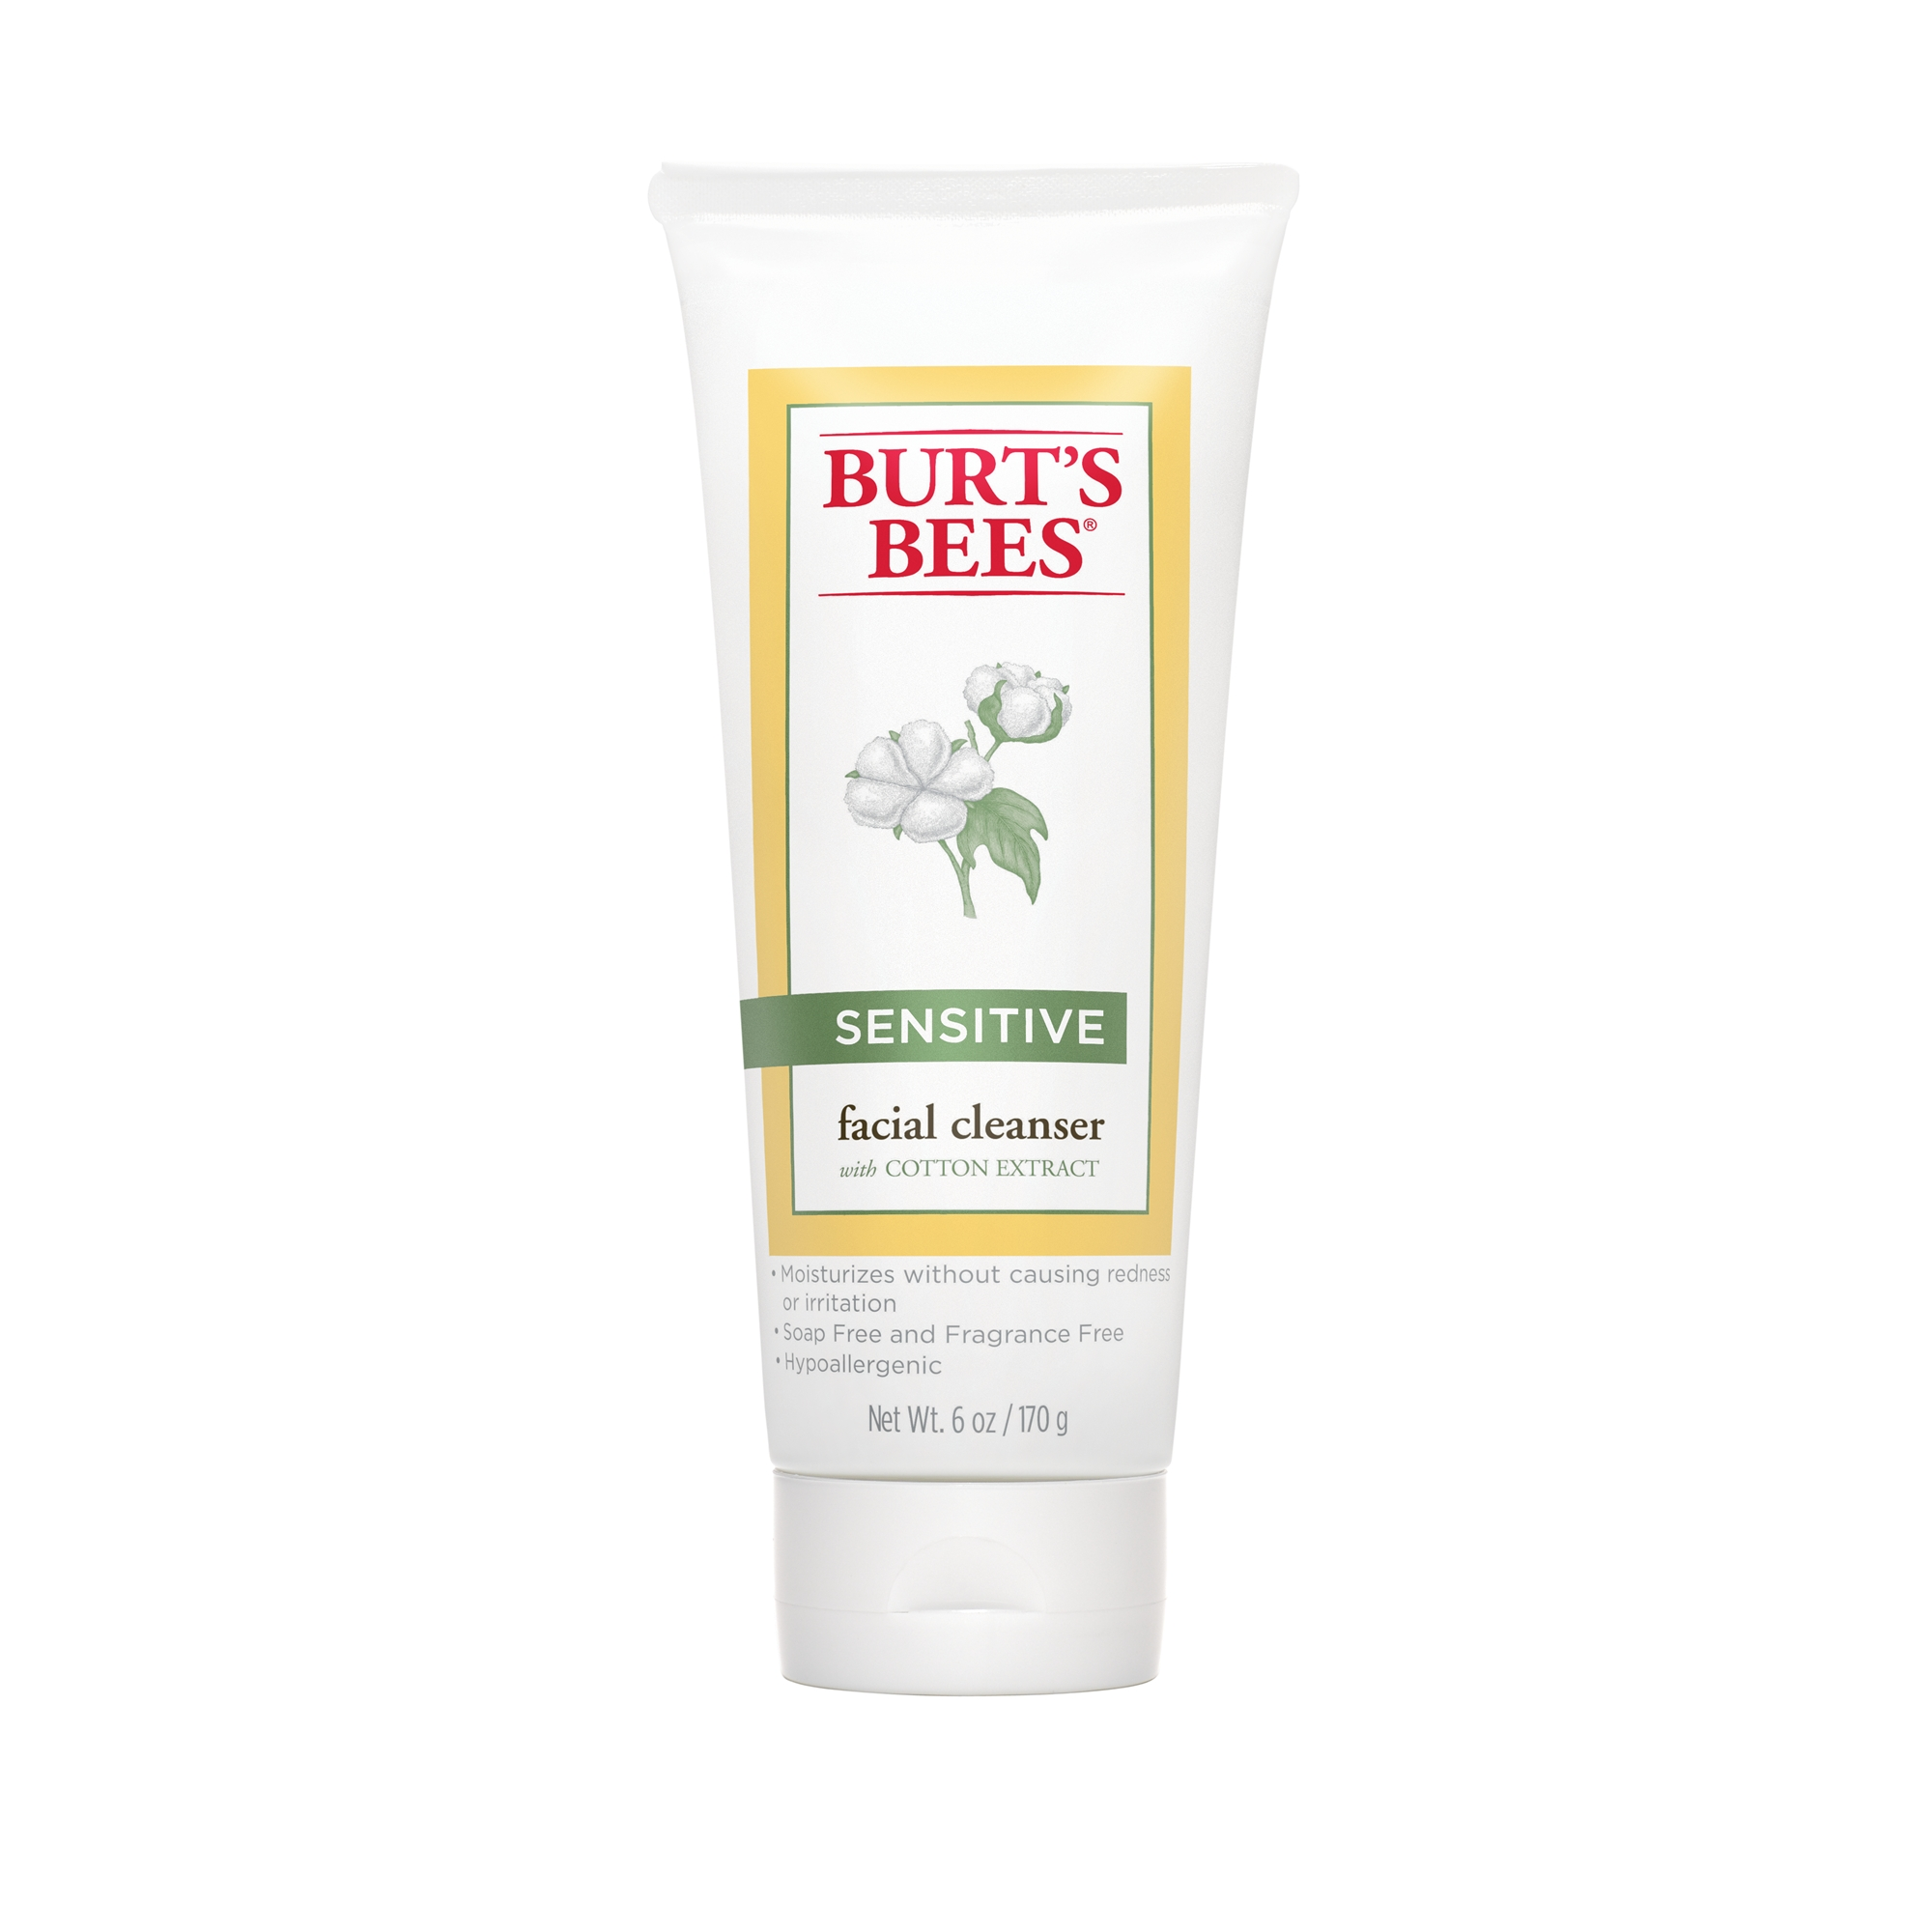 Burt's Bees Face Cleanser for Sensitive Skin, 6 oz